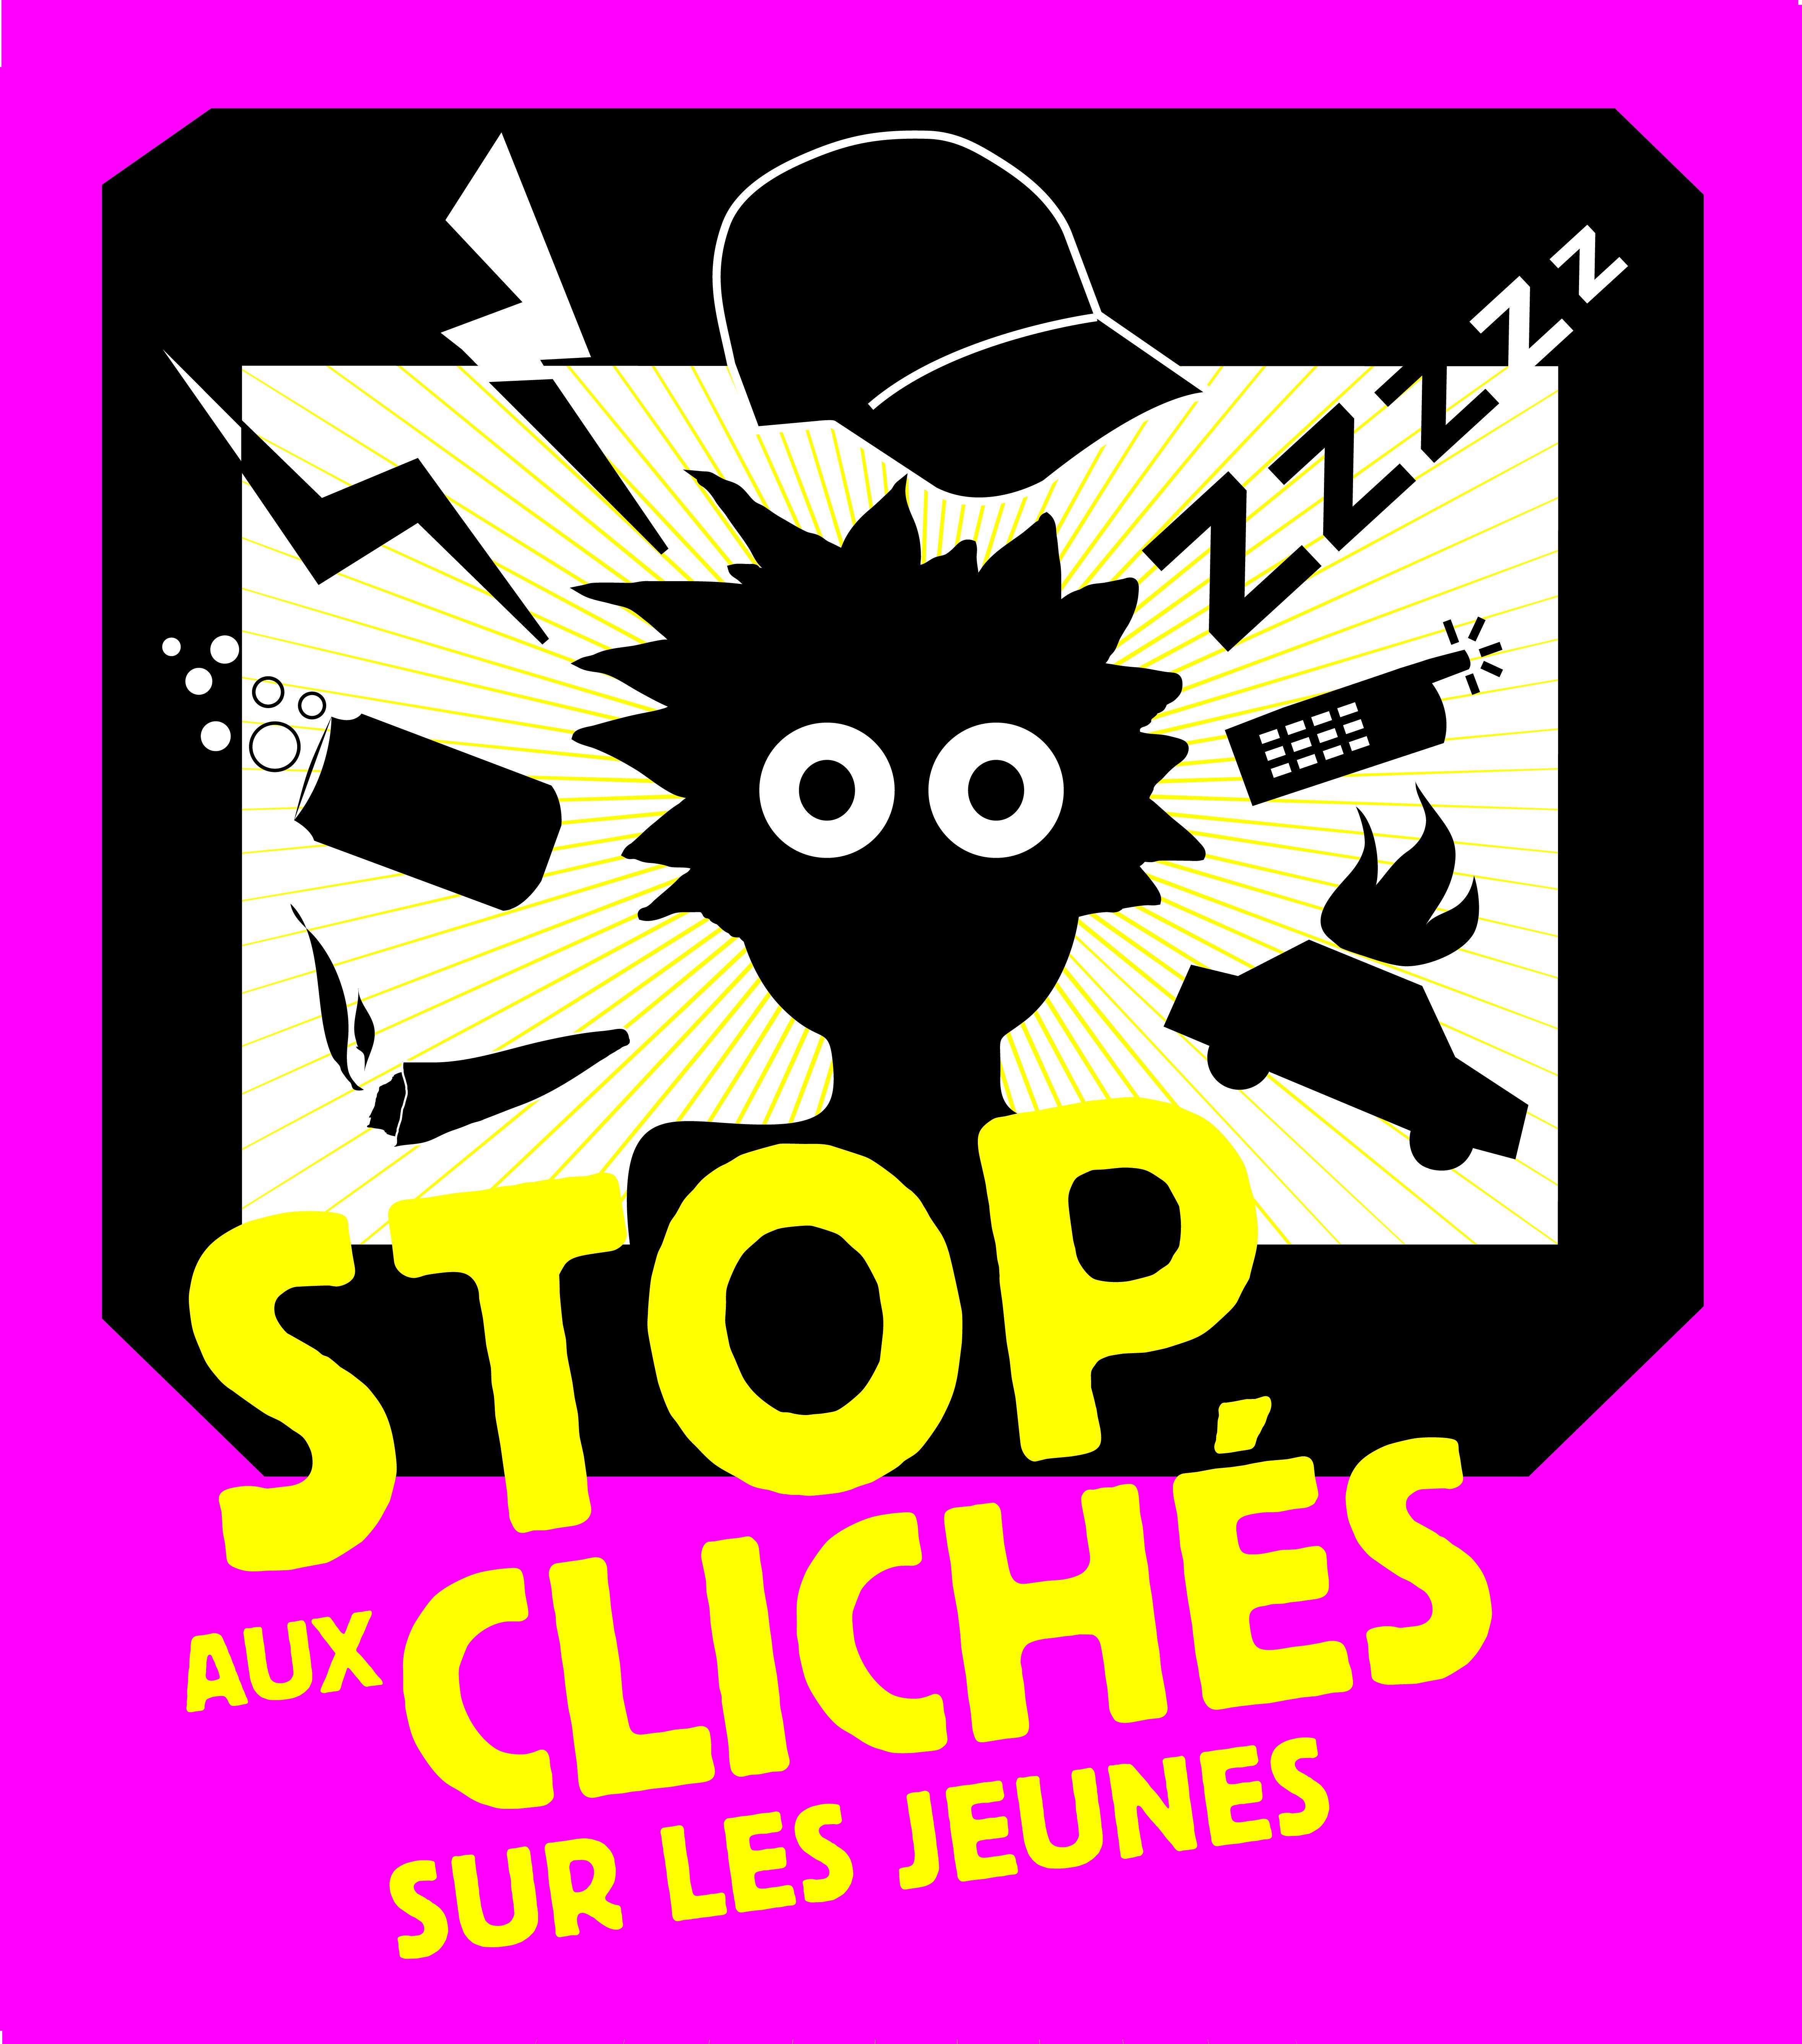 Stop Clichés